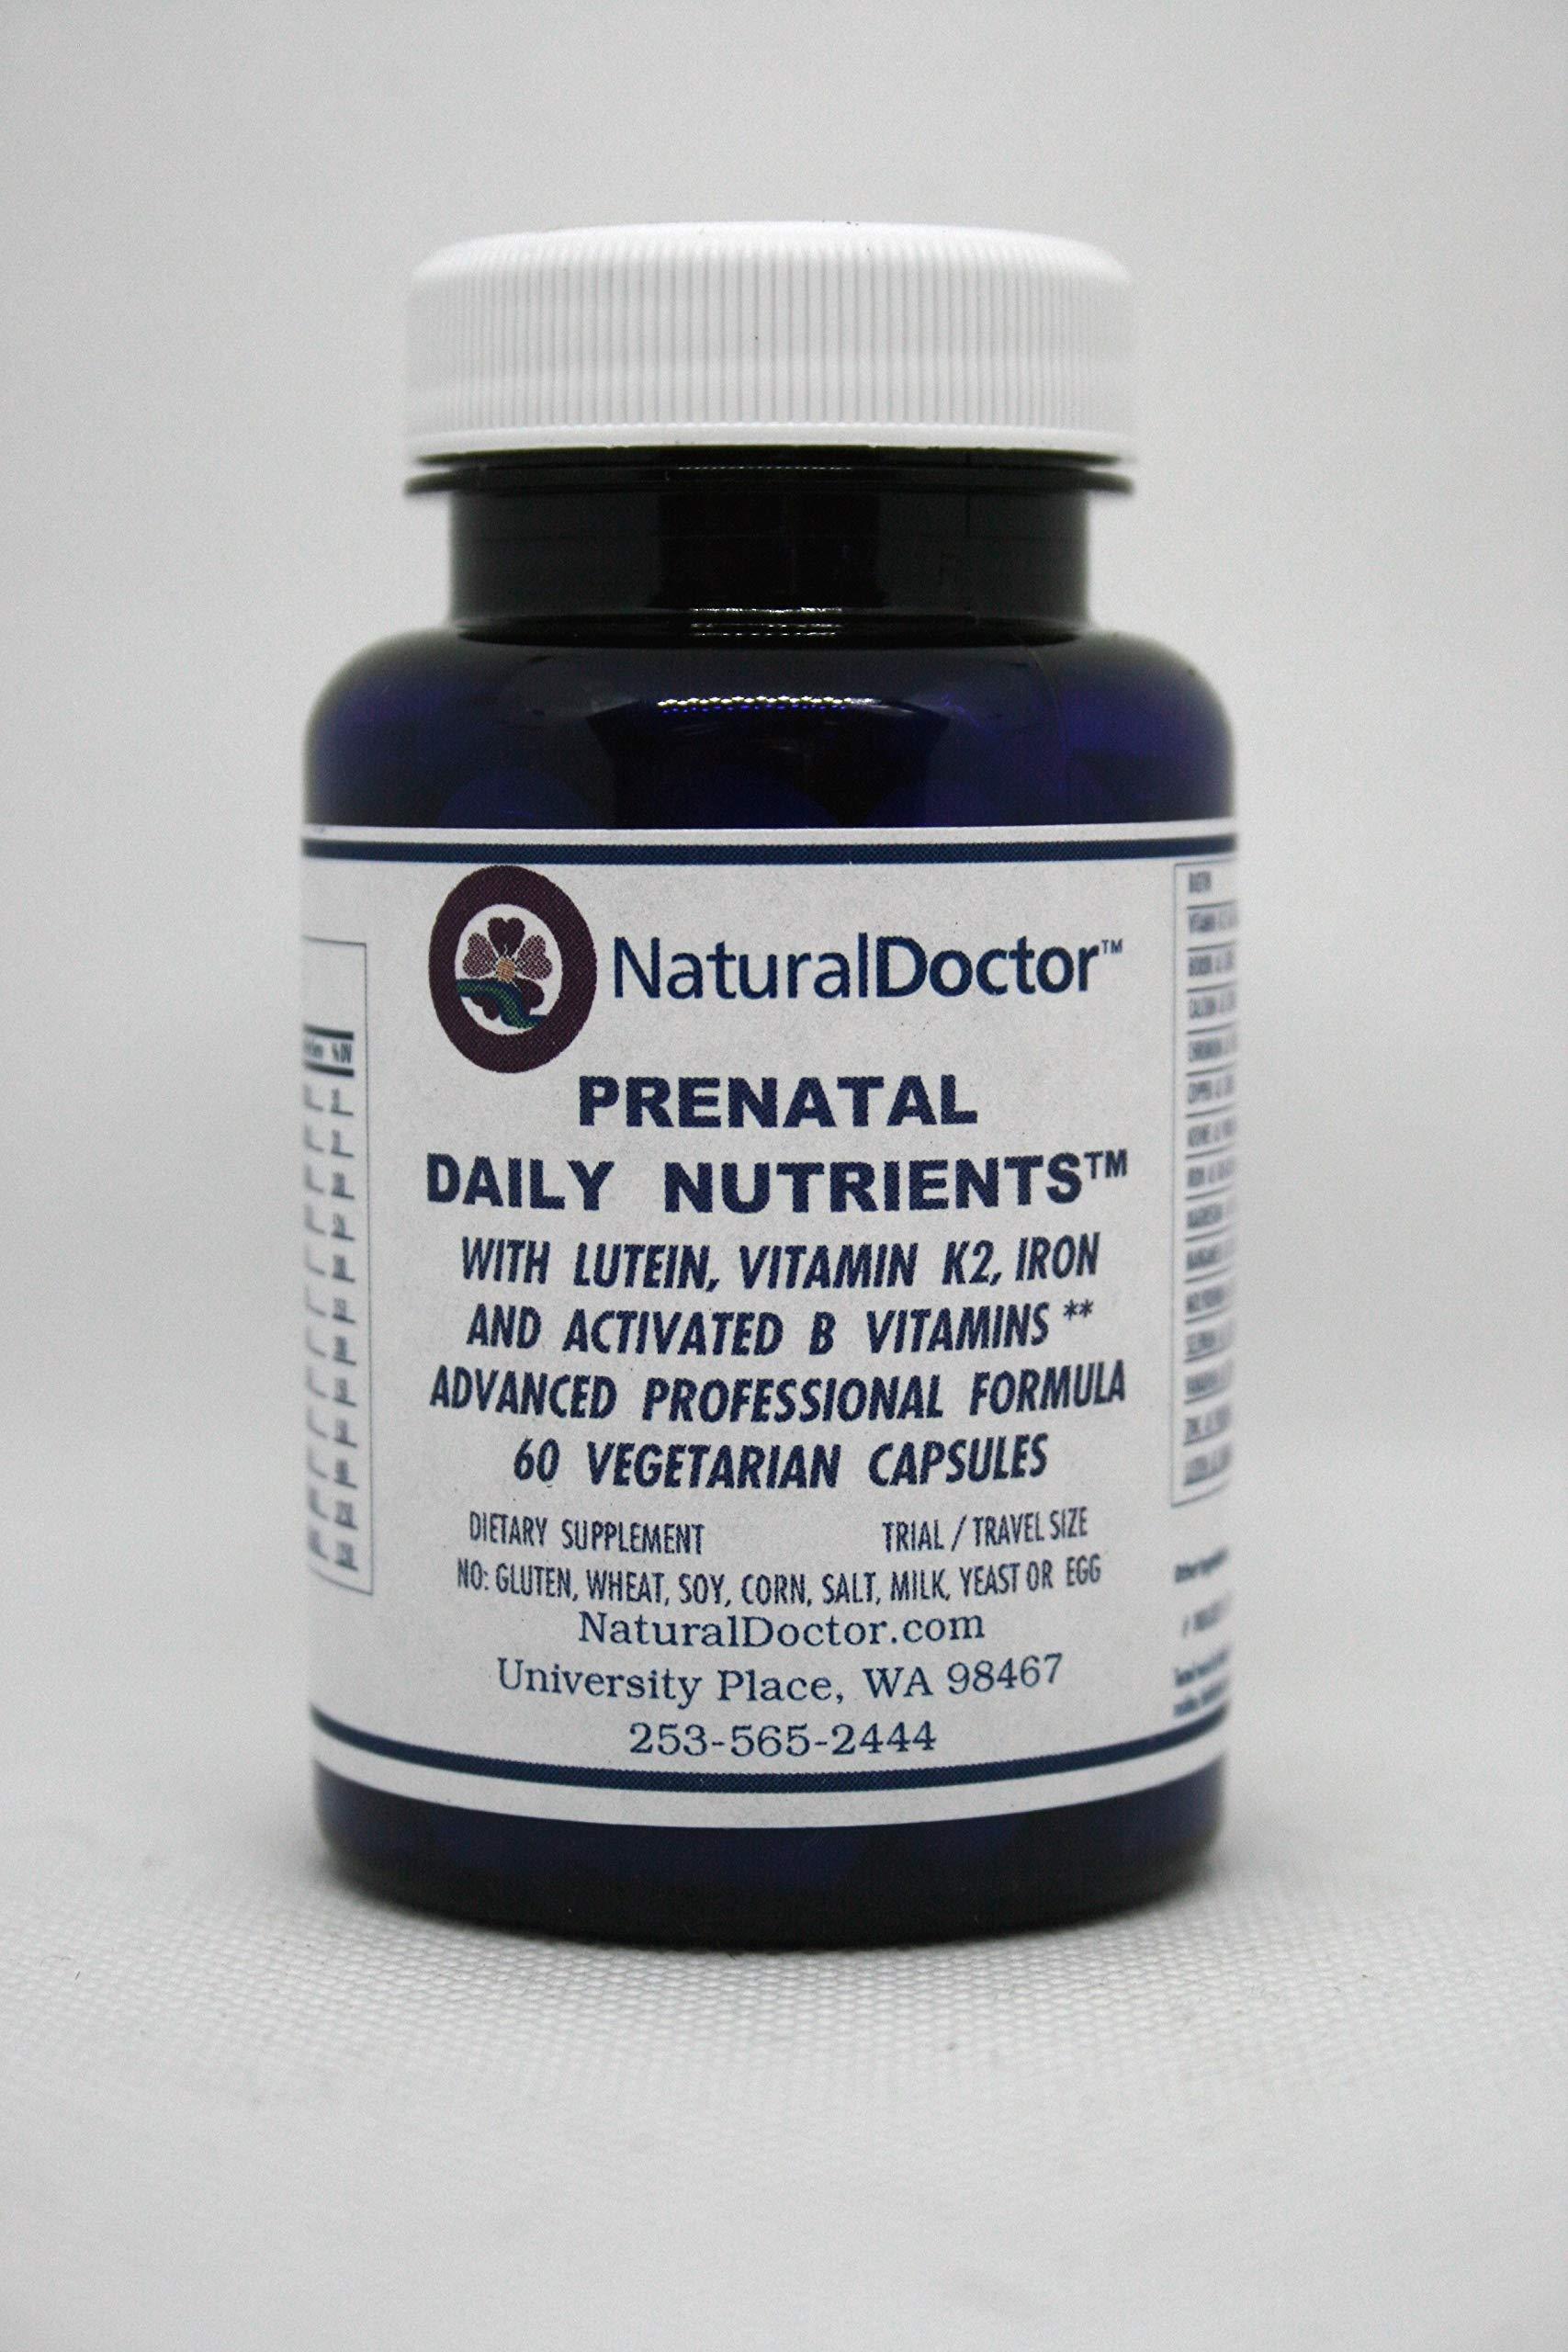 NaturalDoctor Prenatal Daily Nutrients 60 Veg Caps